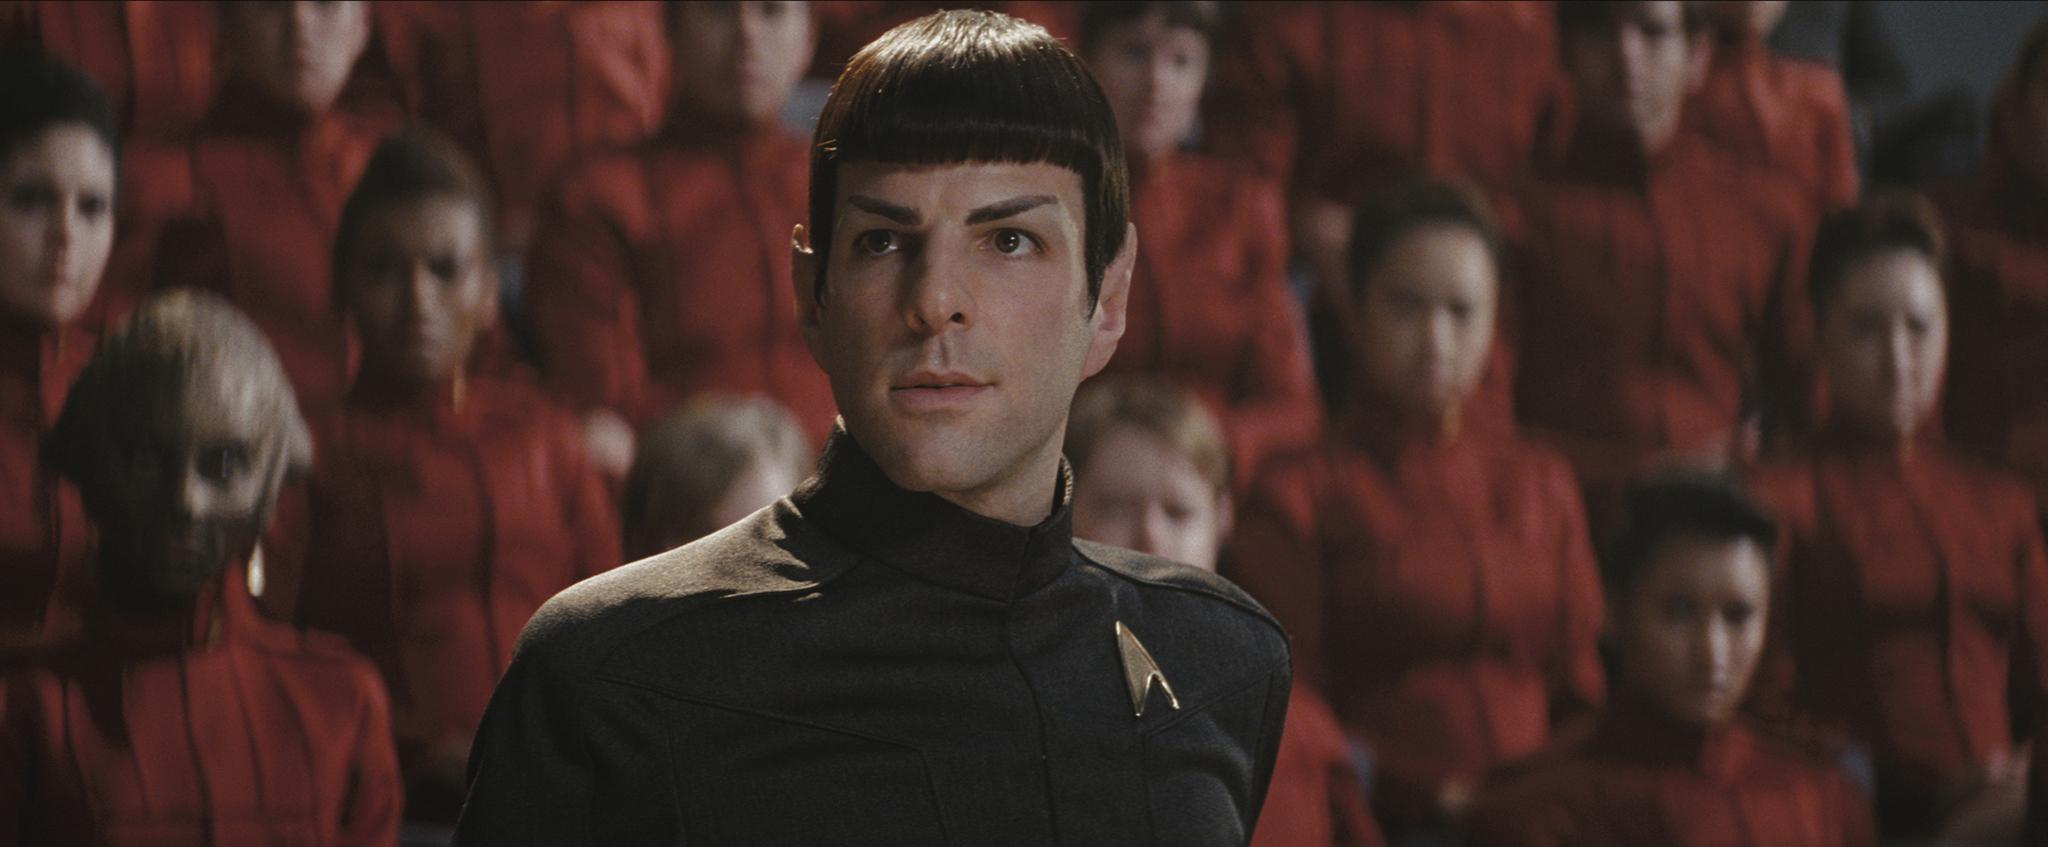 Zachary Quinto in Star Trek (2009)